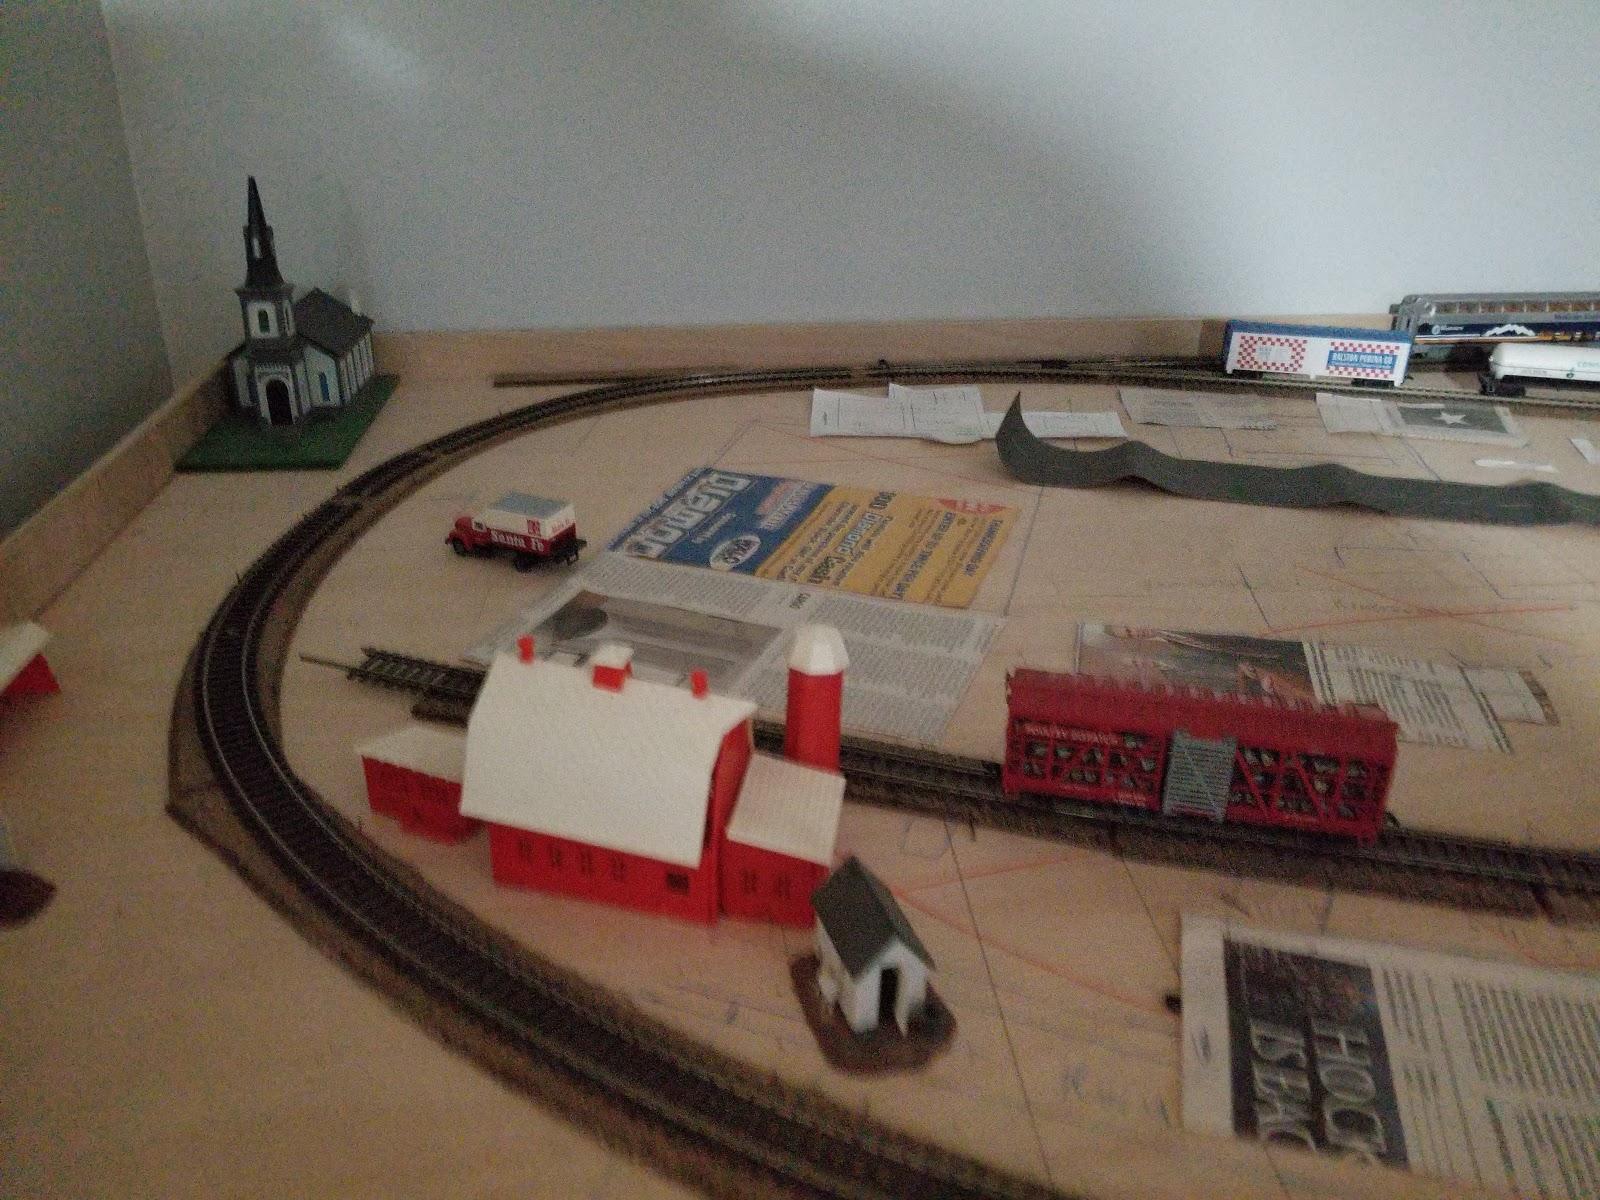 Kenward's Modle Railroad